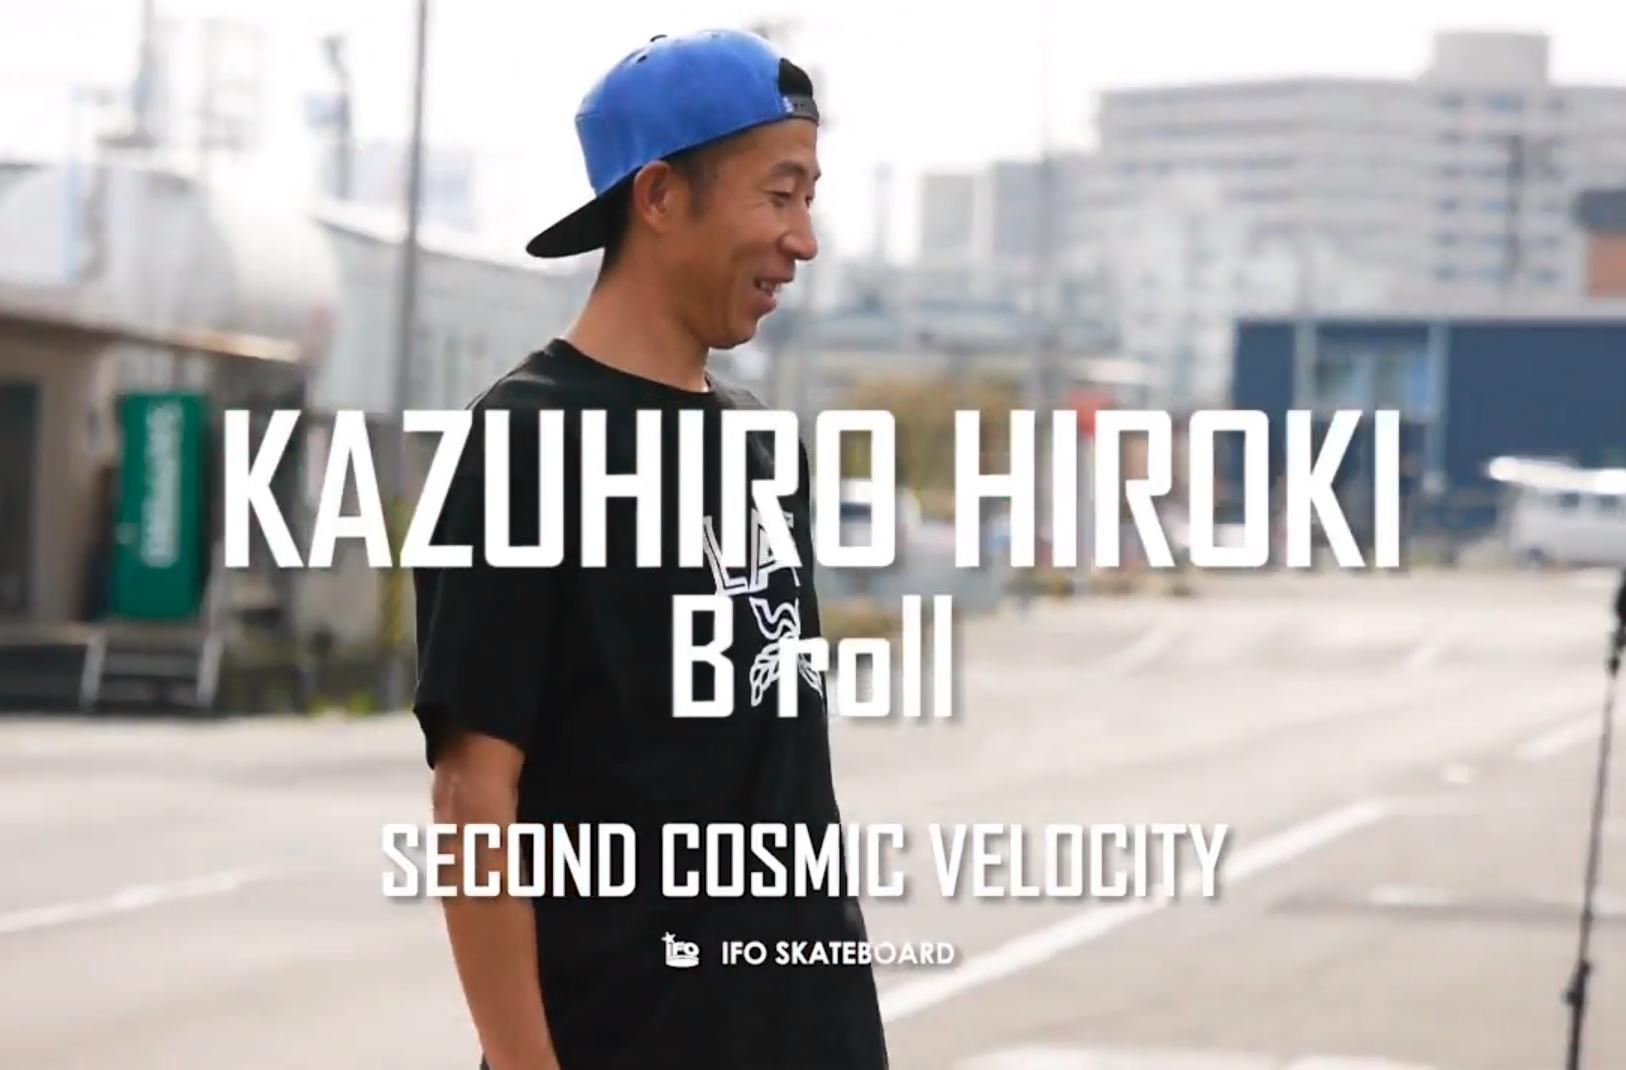 broll_hiroki_k_insta